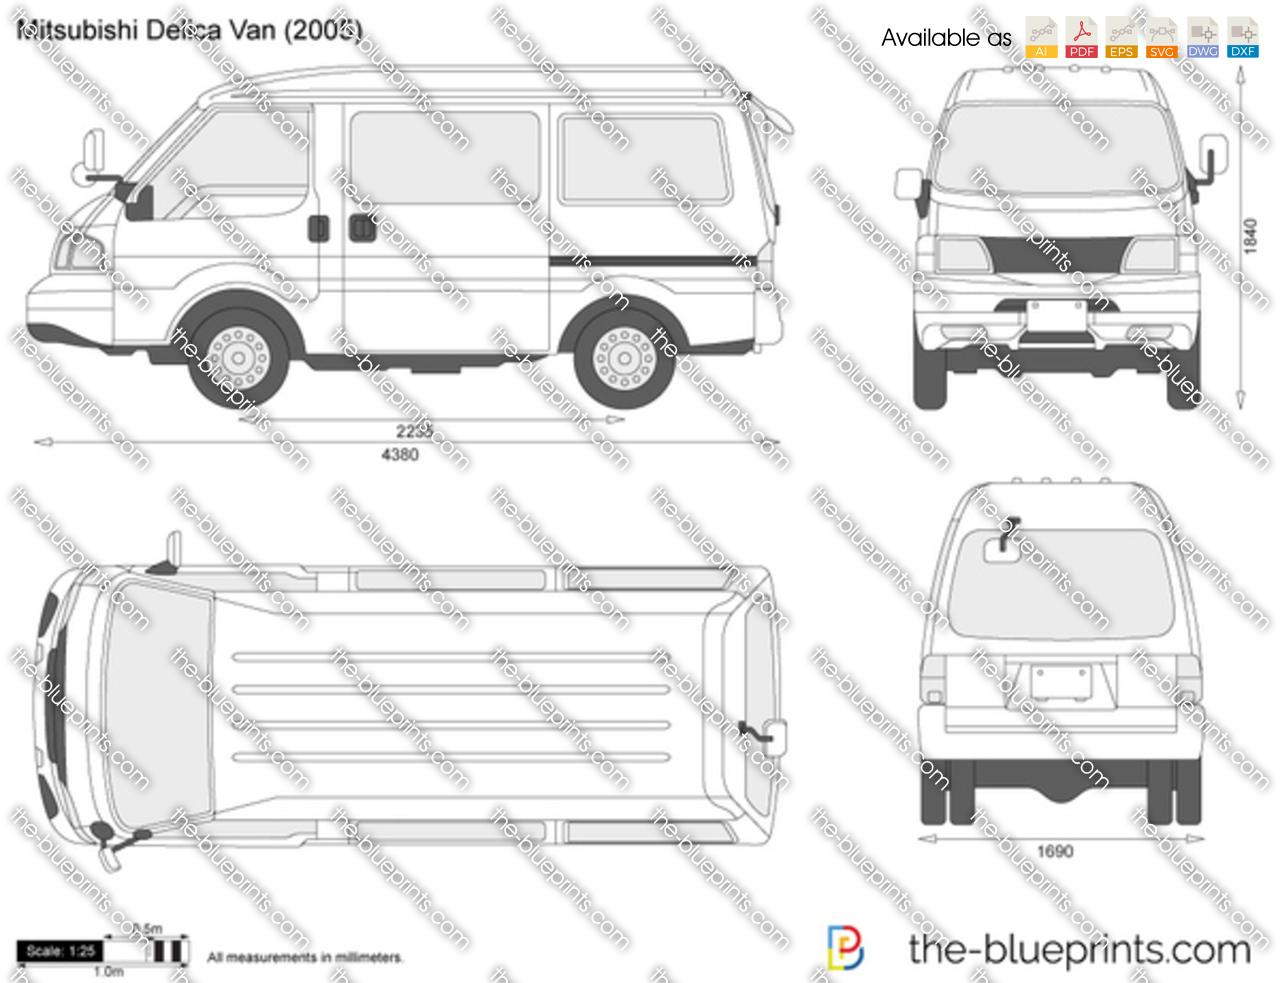 Mitsubishi Delica Van 1989